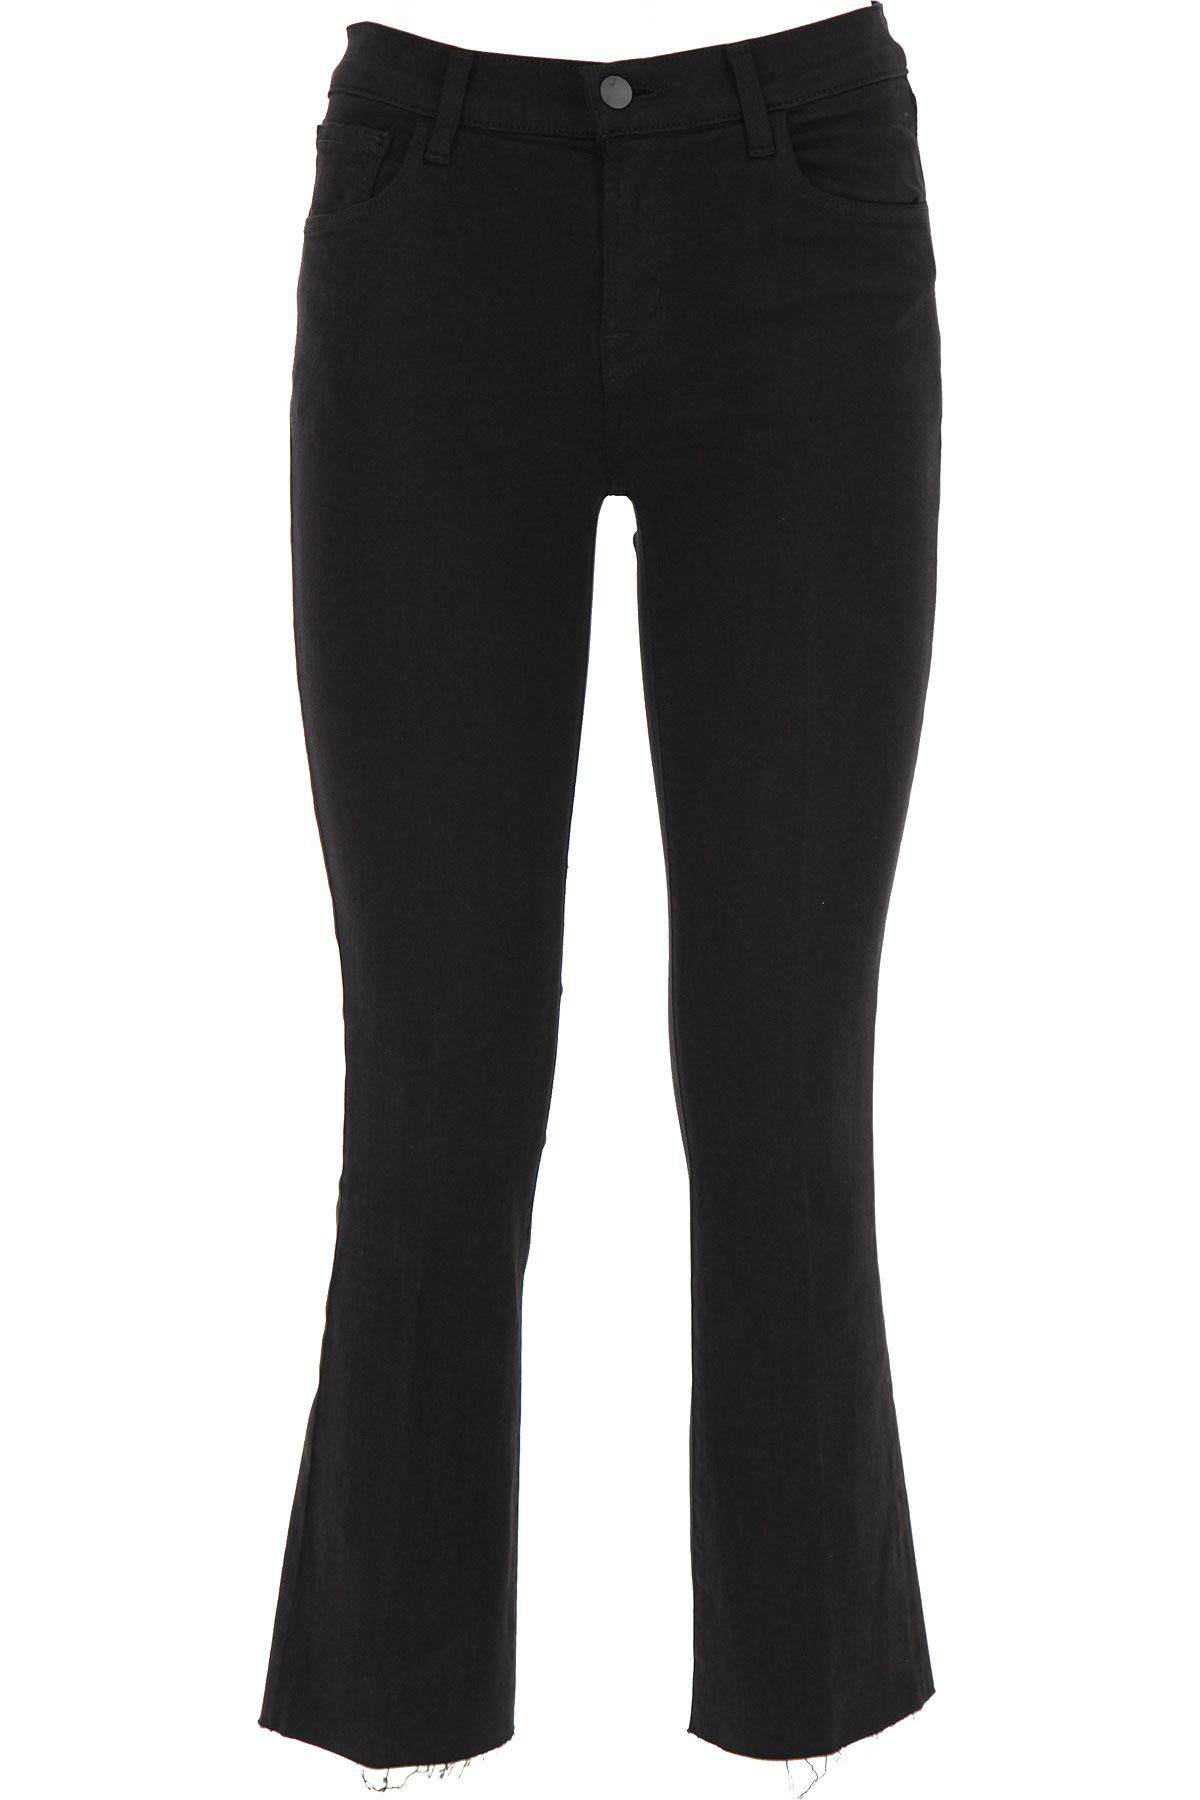 J Brand Jeans On Sale, Black, Cotton, 2019, 24 27 28